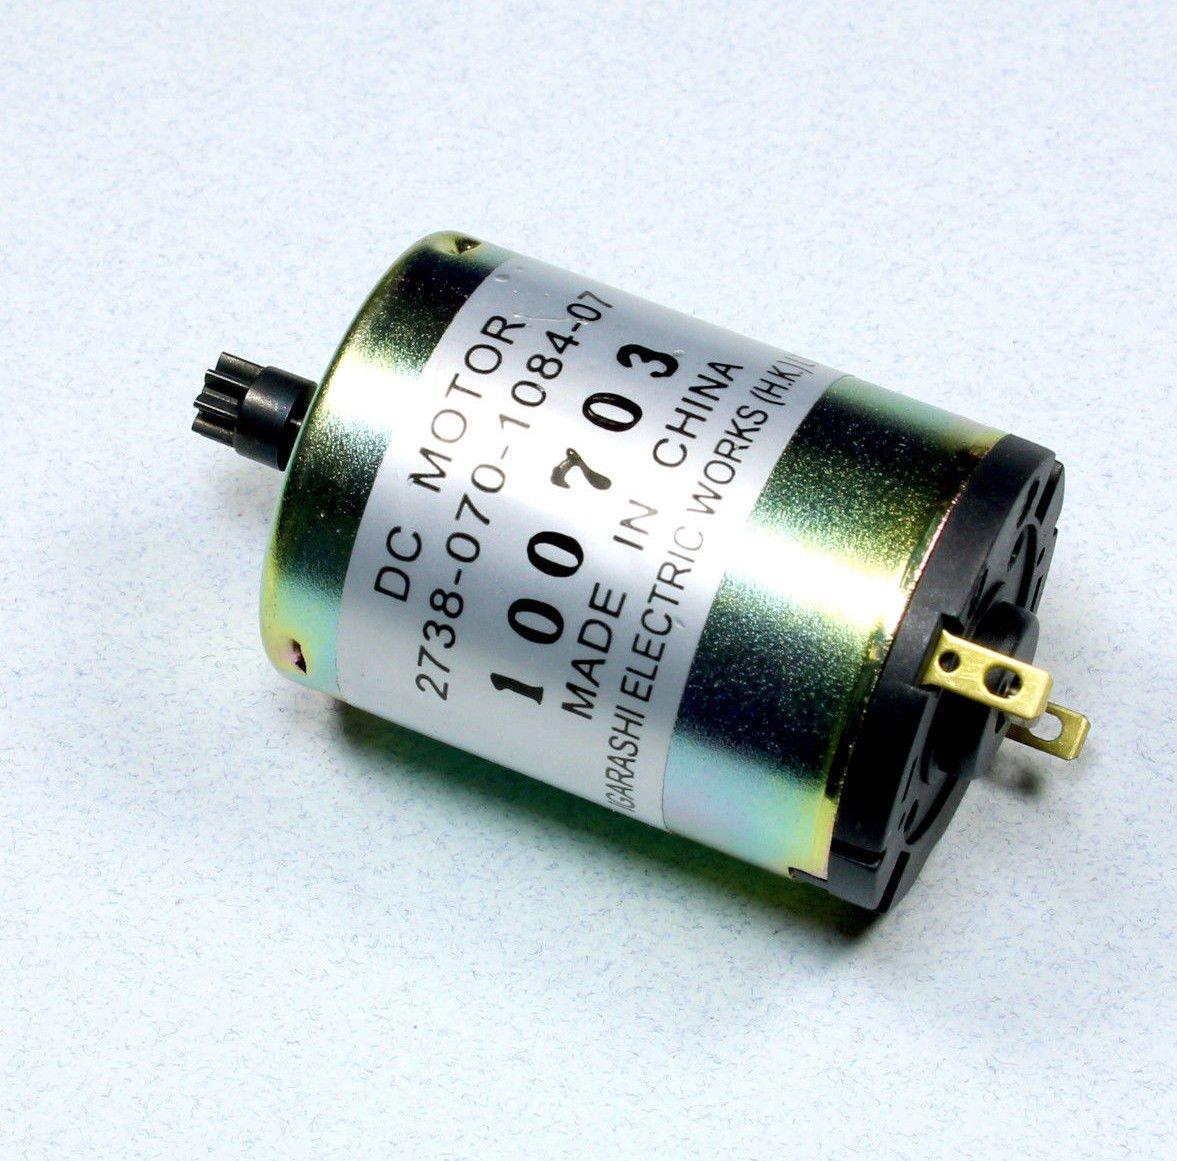 12 V Igarashi DC Motor with 8 Tooth Gear 10000 RPM 12 VDC 10,000 RPM